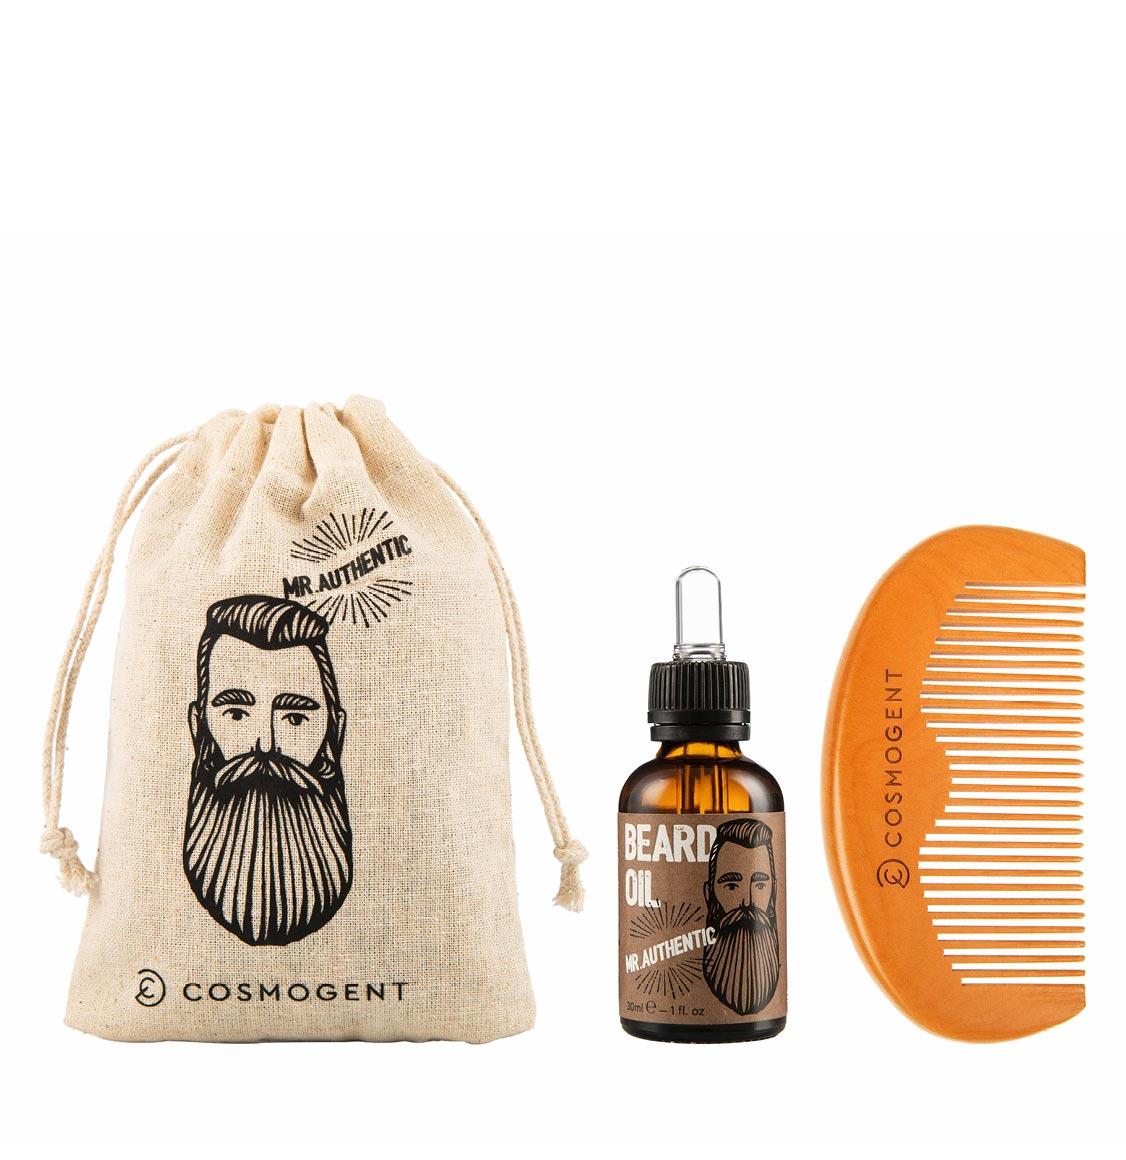 Cosmogent Mr Authentic Bundle Beard Oil 30ml And Beard Comb